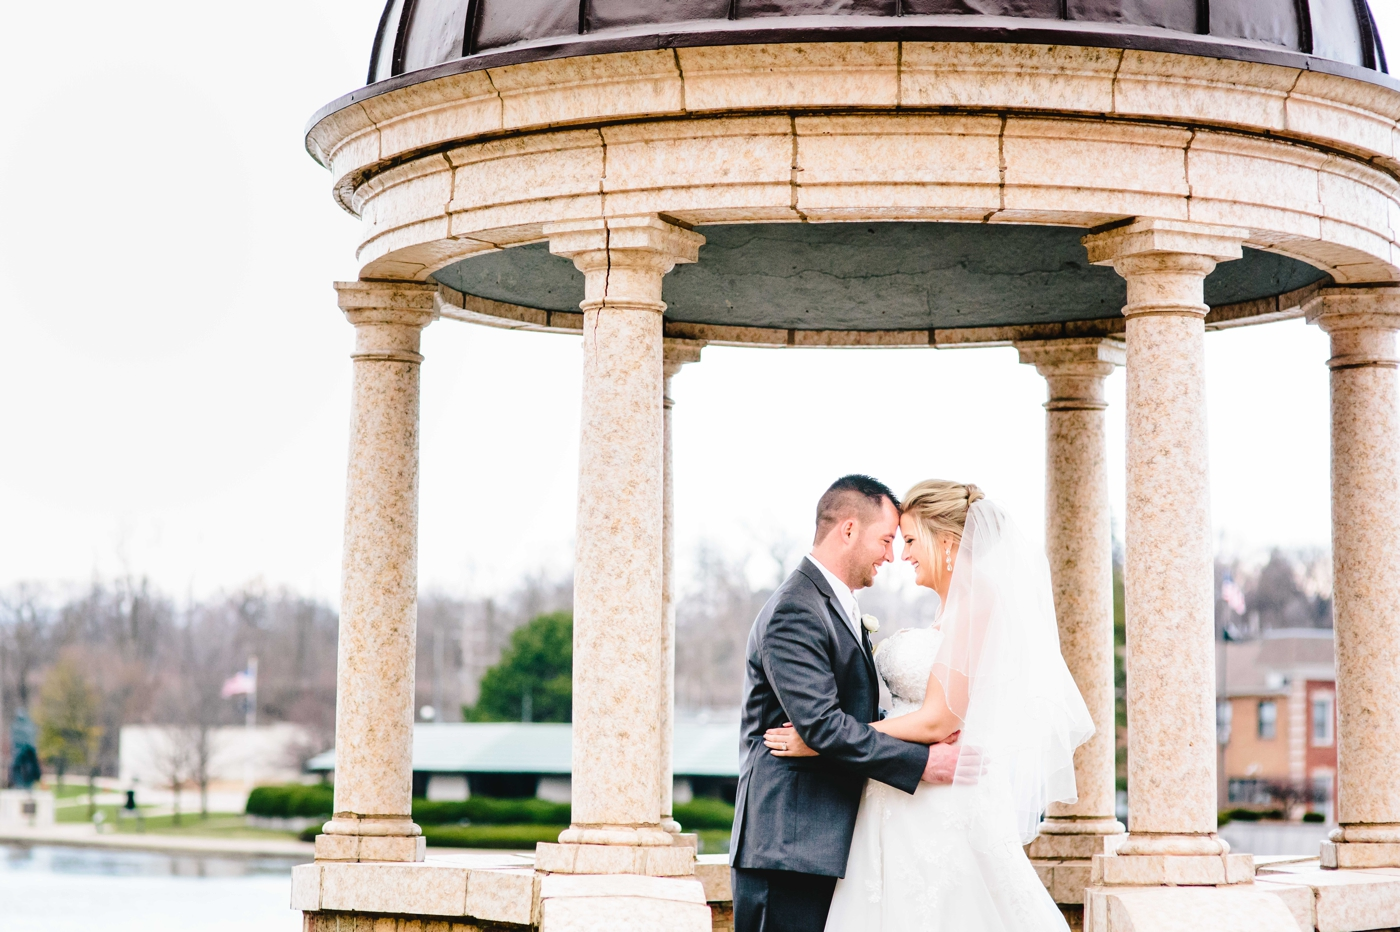 chicago-fine-art-wedding-photography-cassady14